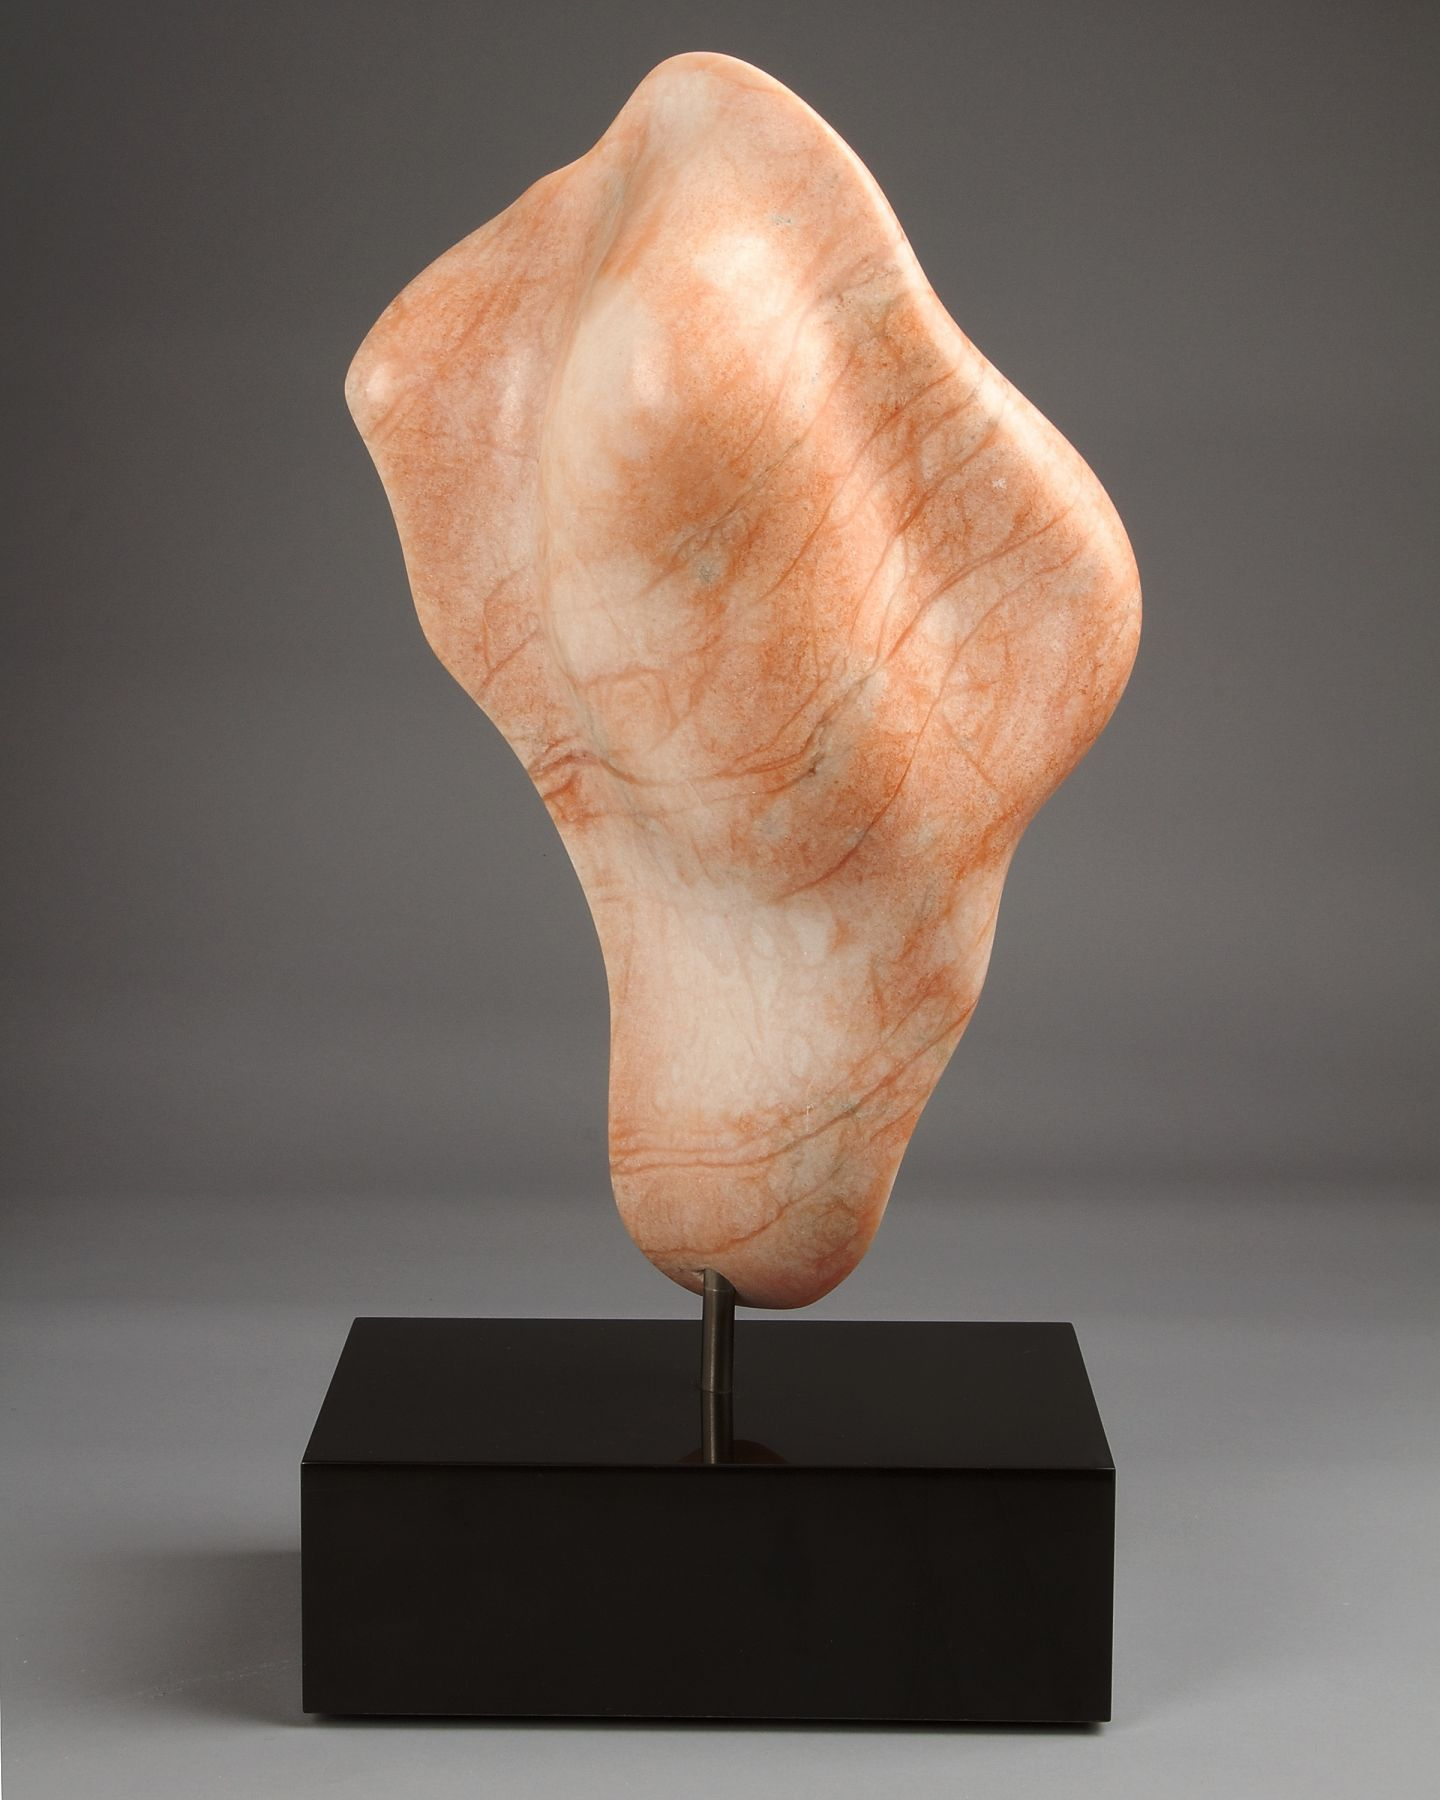 Charlie Kaplan, Embryo, 1993, rear view